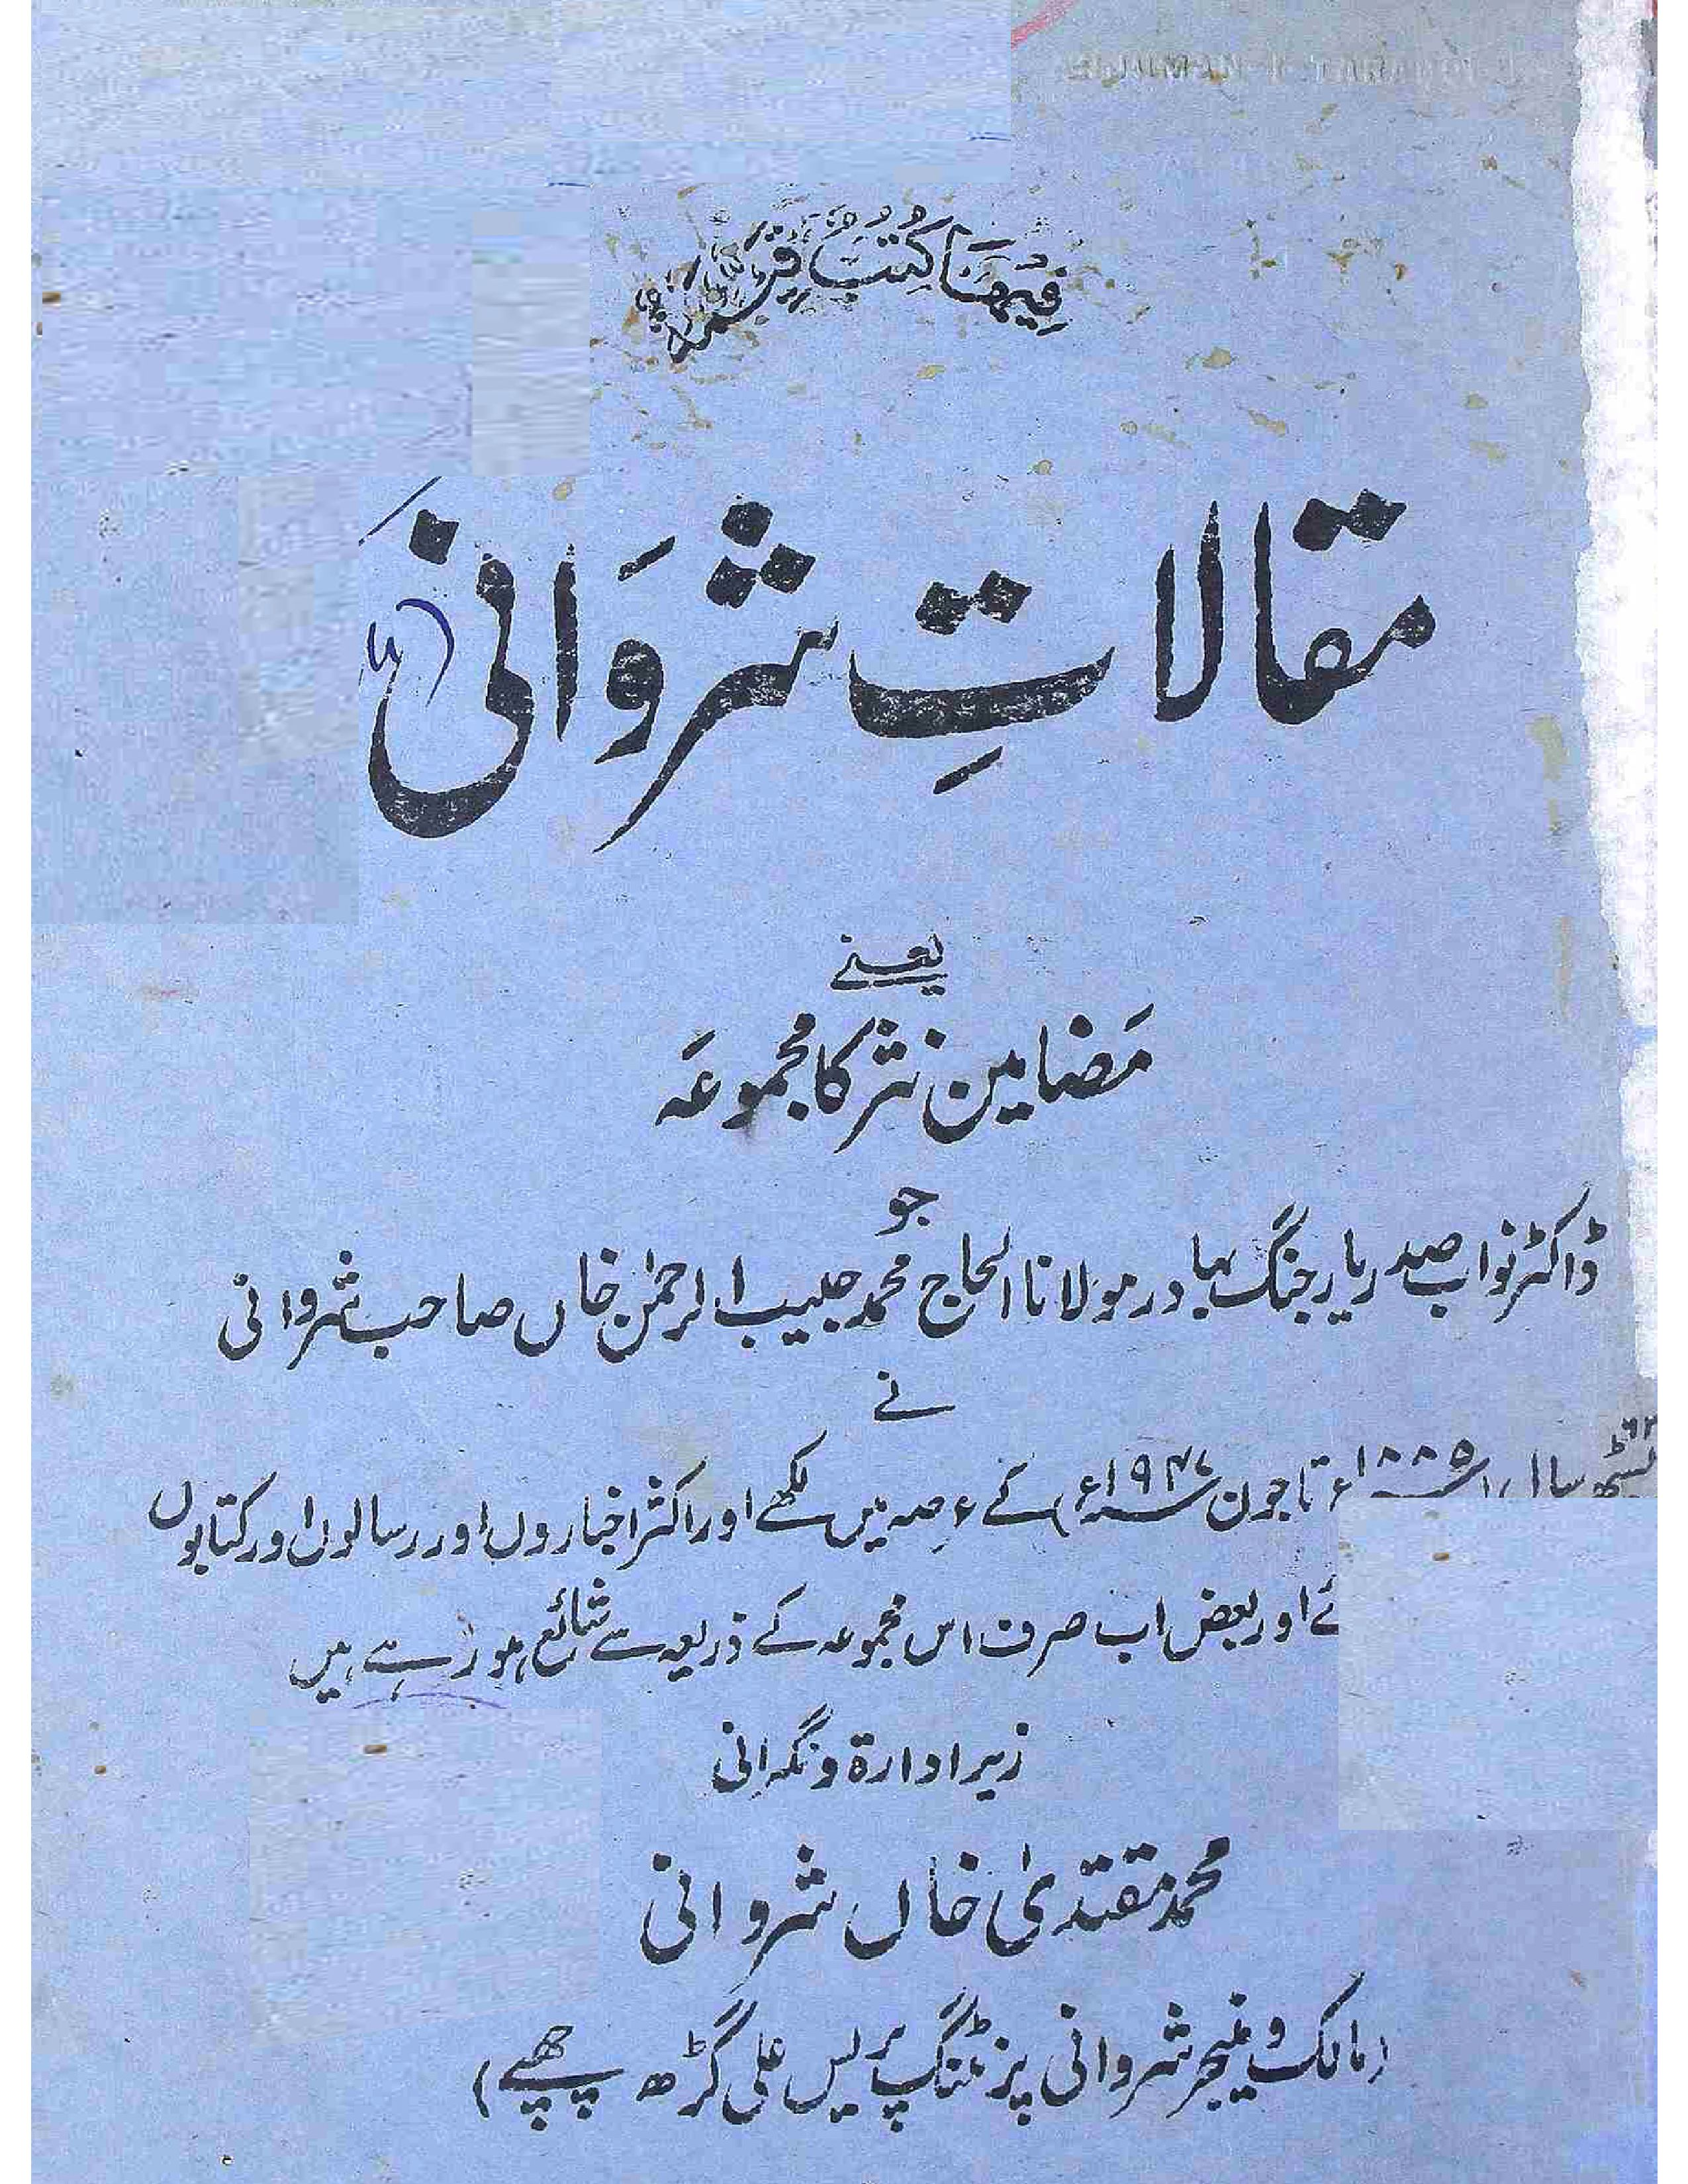 Maqalaat-e-Sharwani